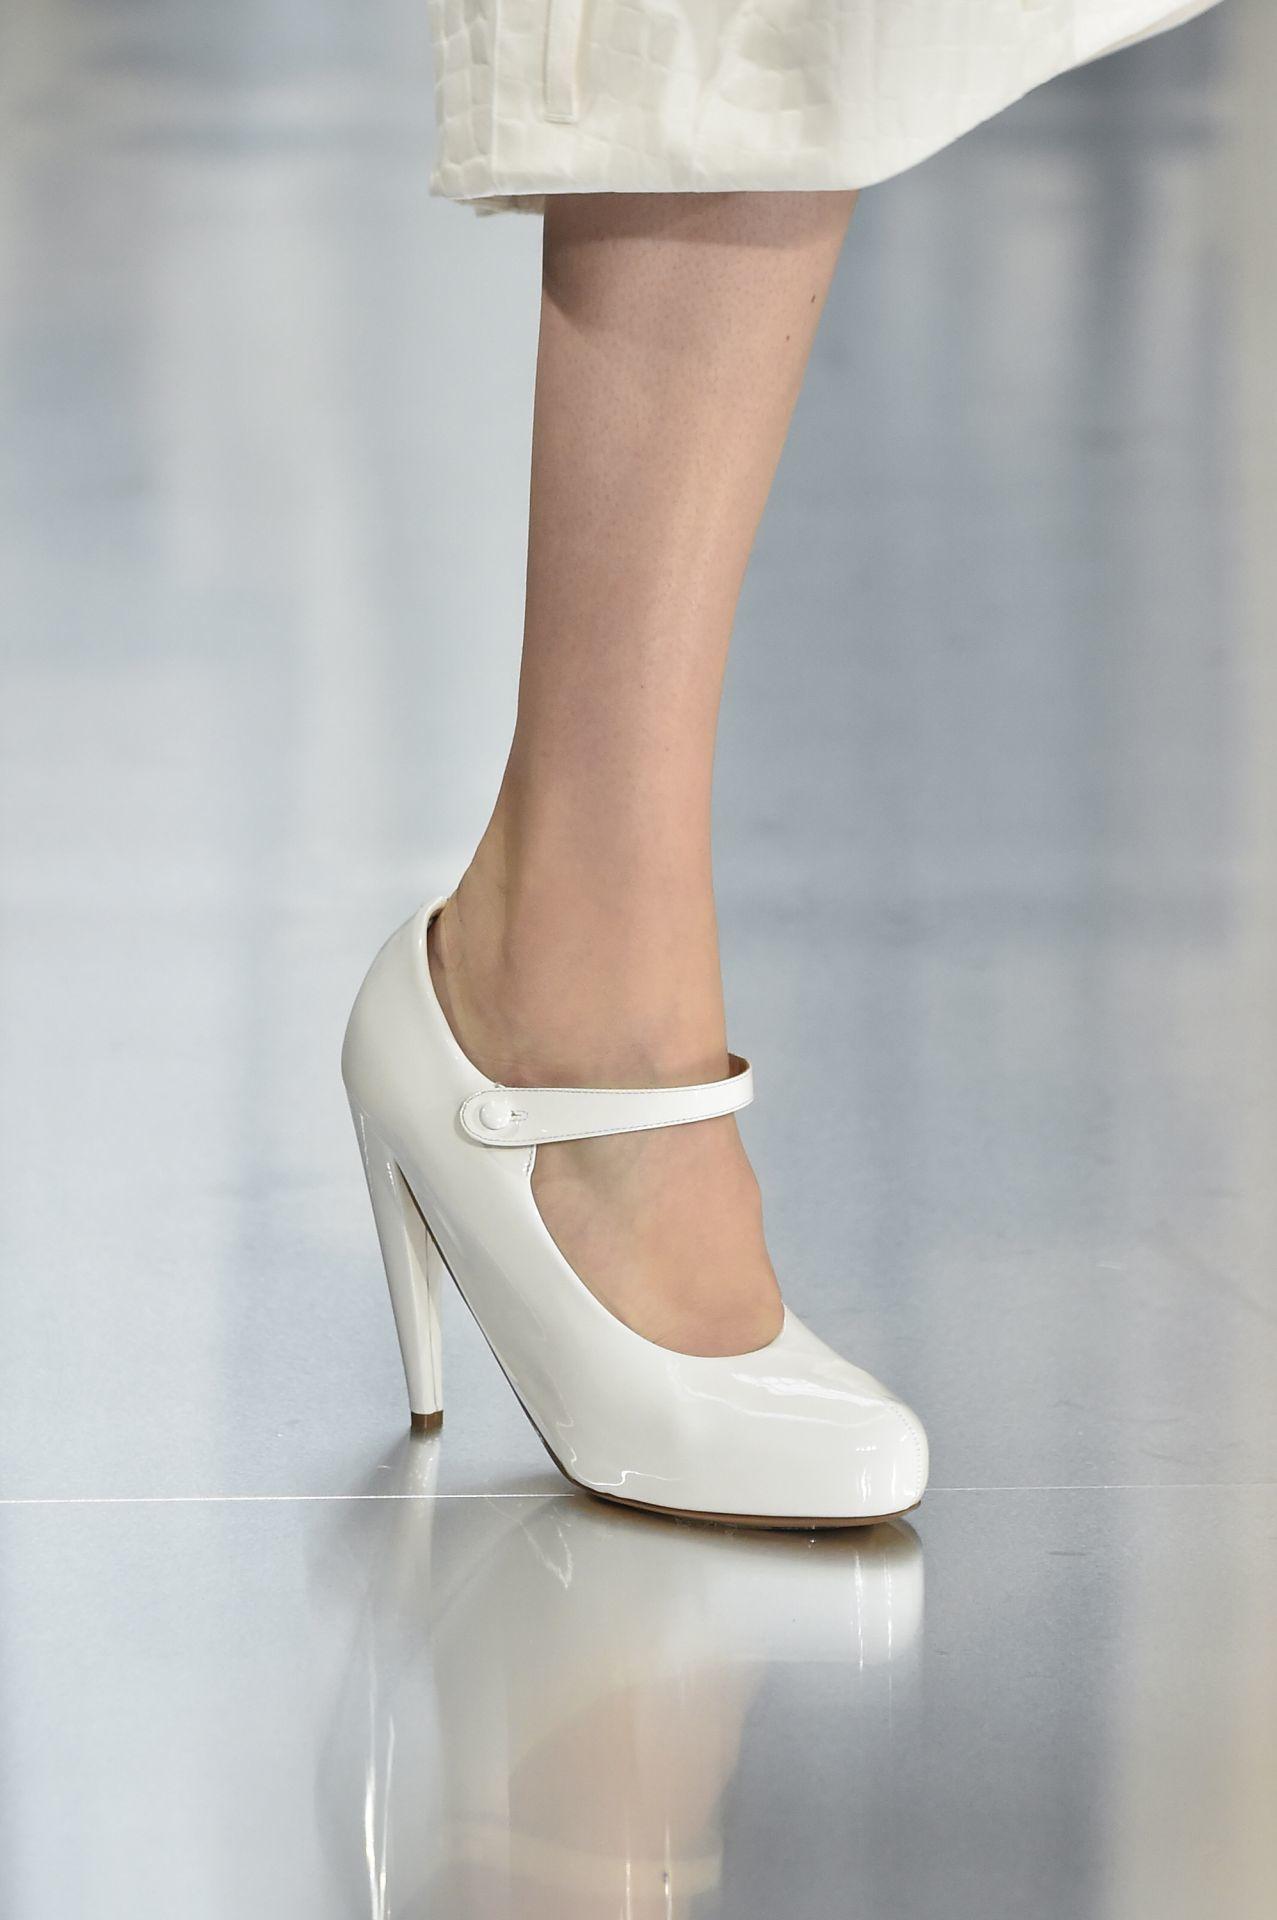 hófehér Mary Jane cipő